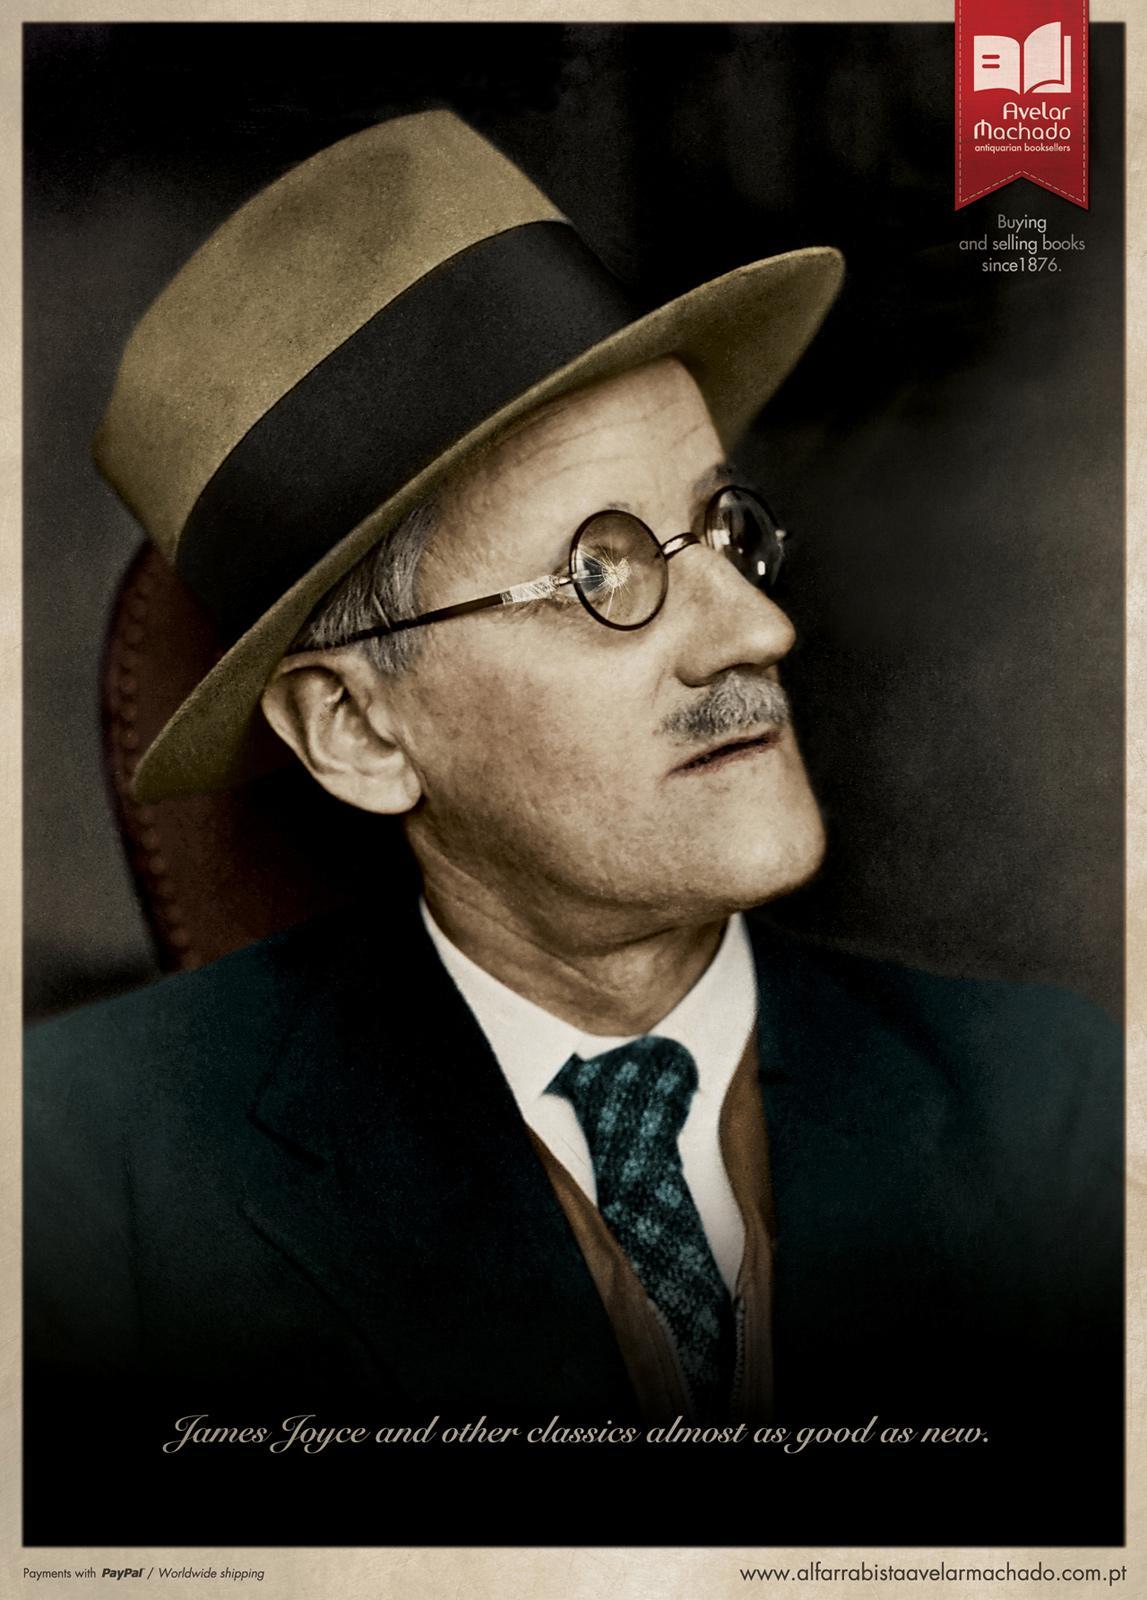 Avelar Machado Print Ad -  James Joyce